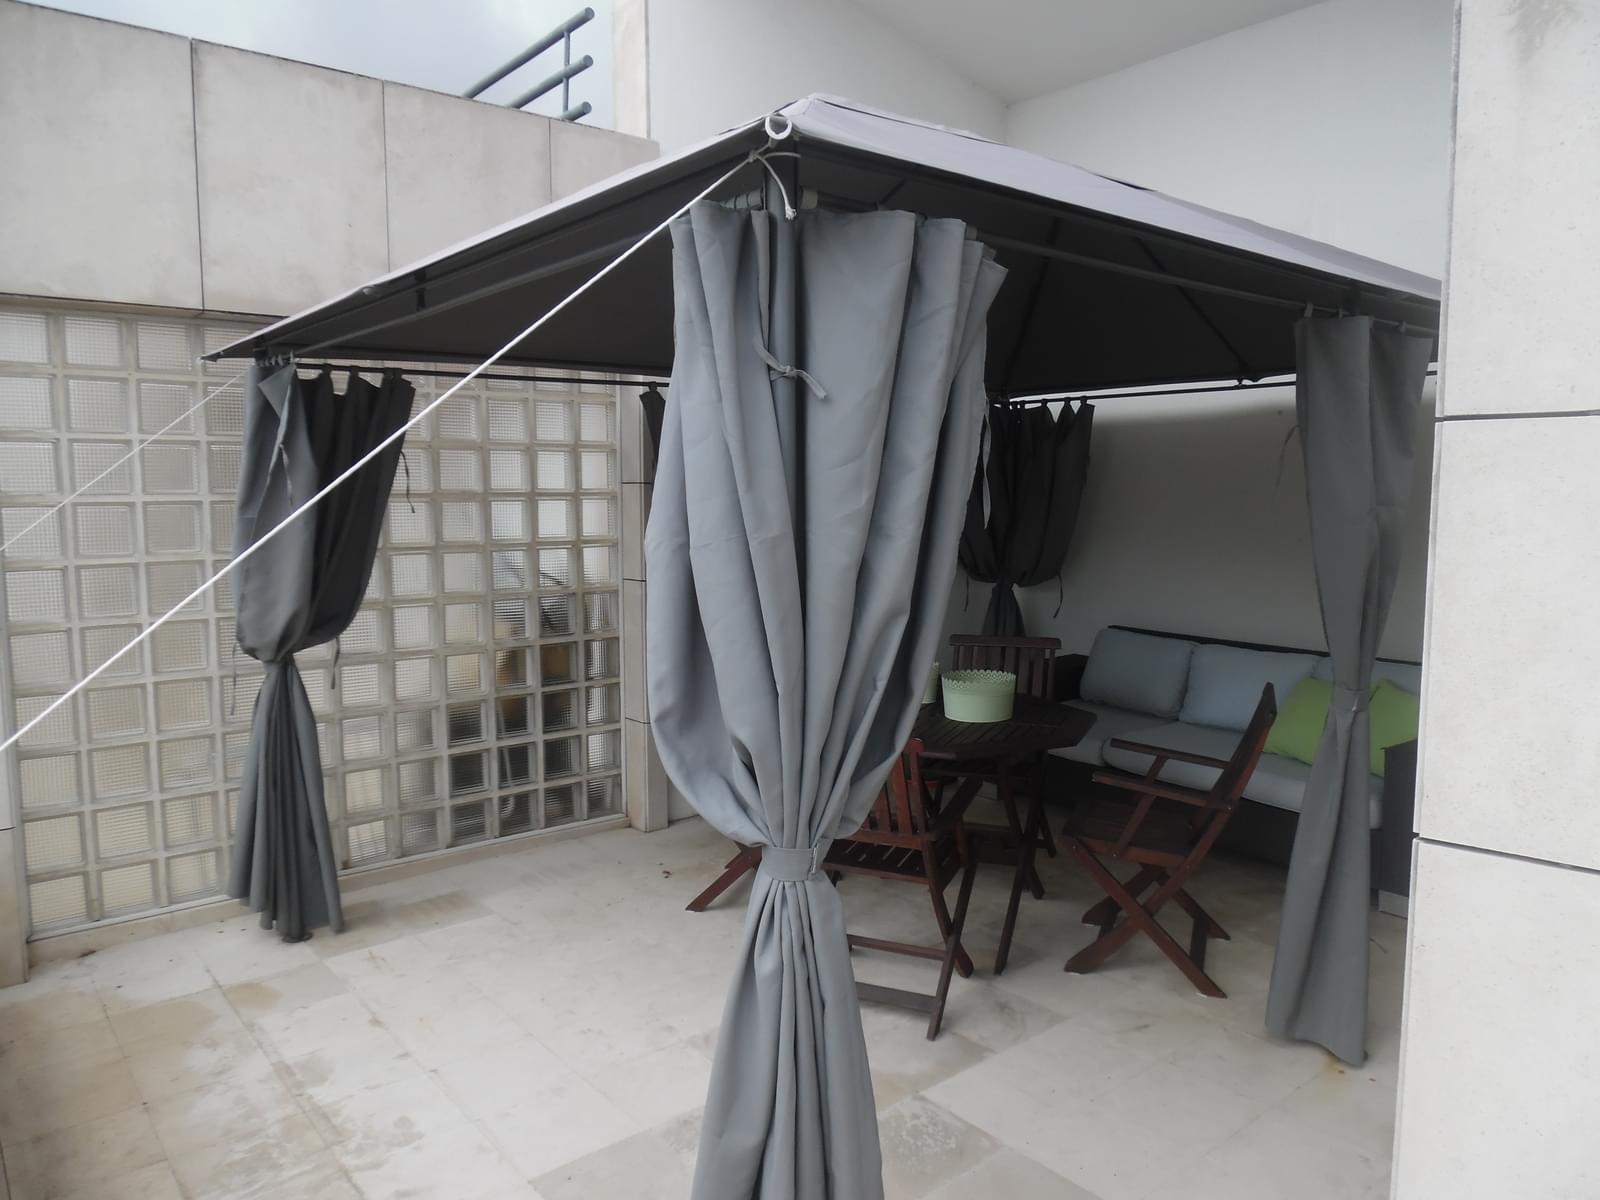 pf18329-apartamento-t1-lisboa-bdeb7b45-24a7-402a-a998-7f0963cac4a8